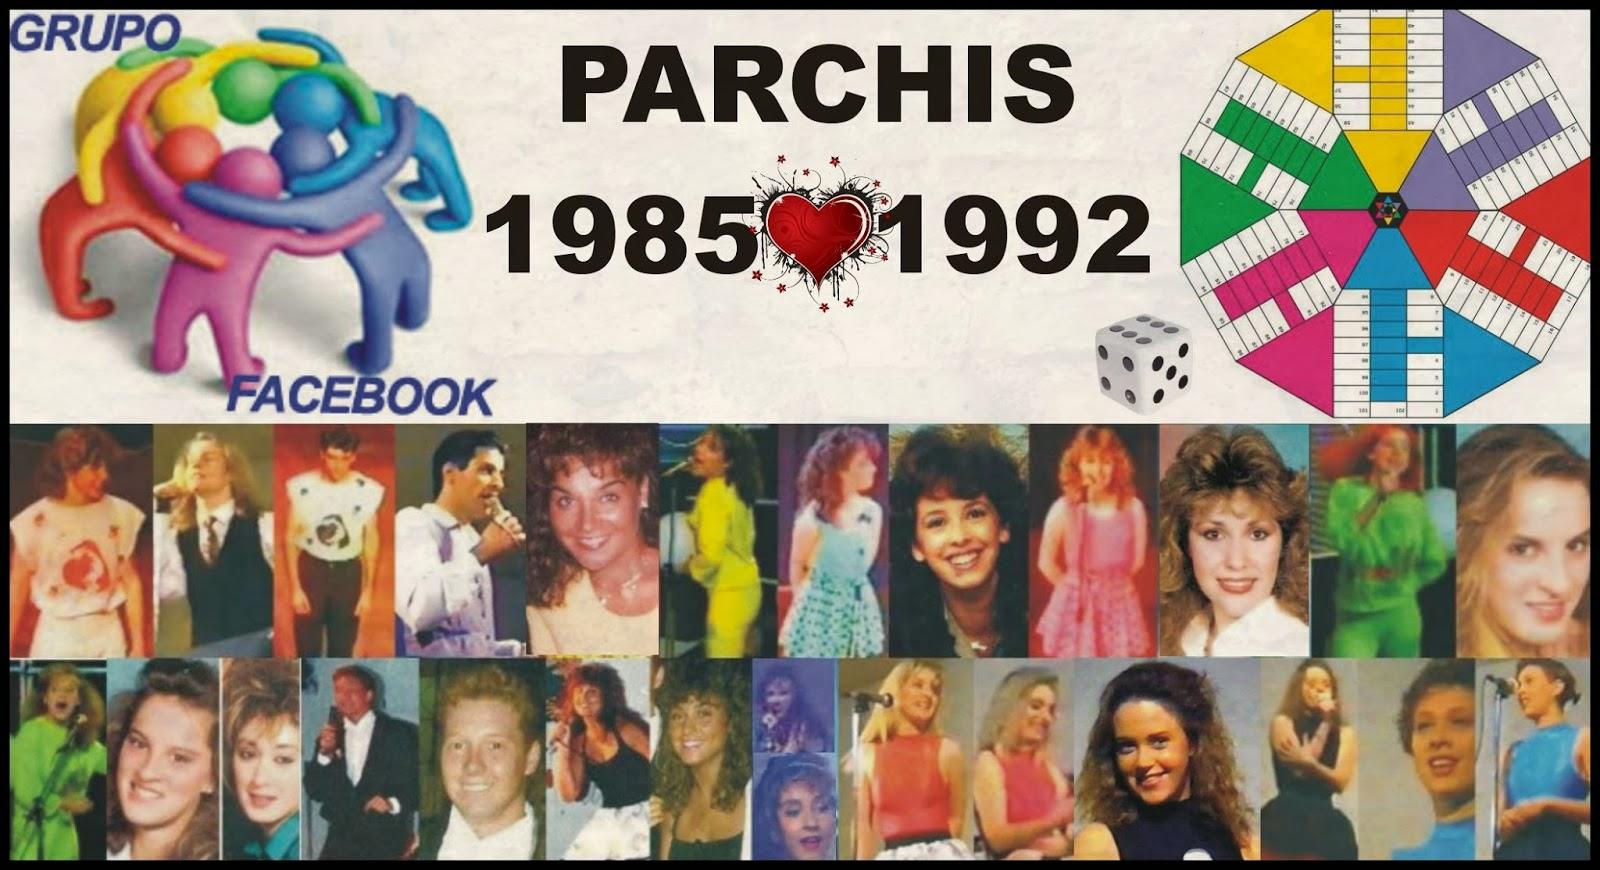 Parchis la saga etapa 1985 1992 reconocida por divucsa for Grupo facebook